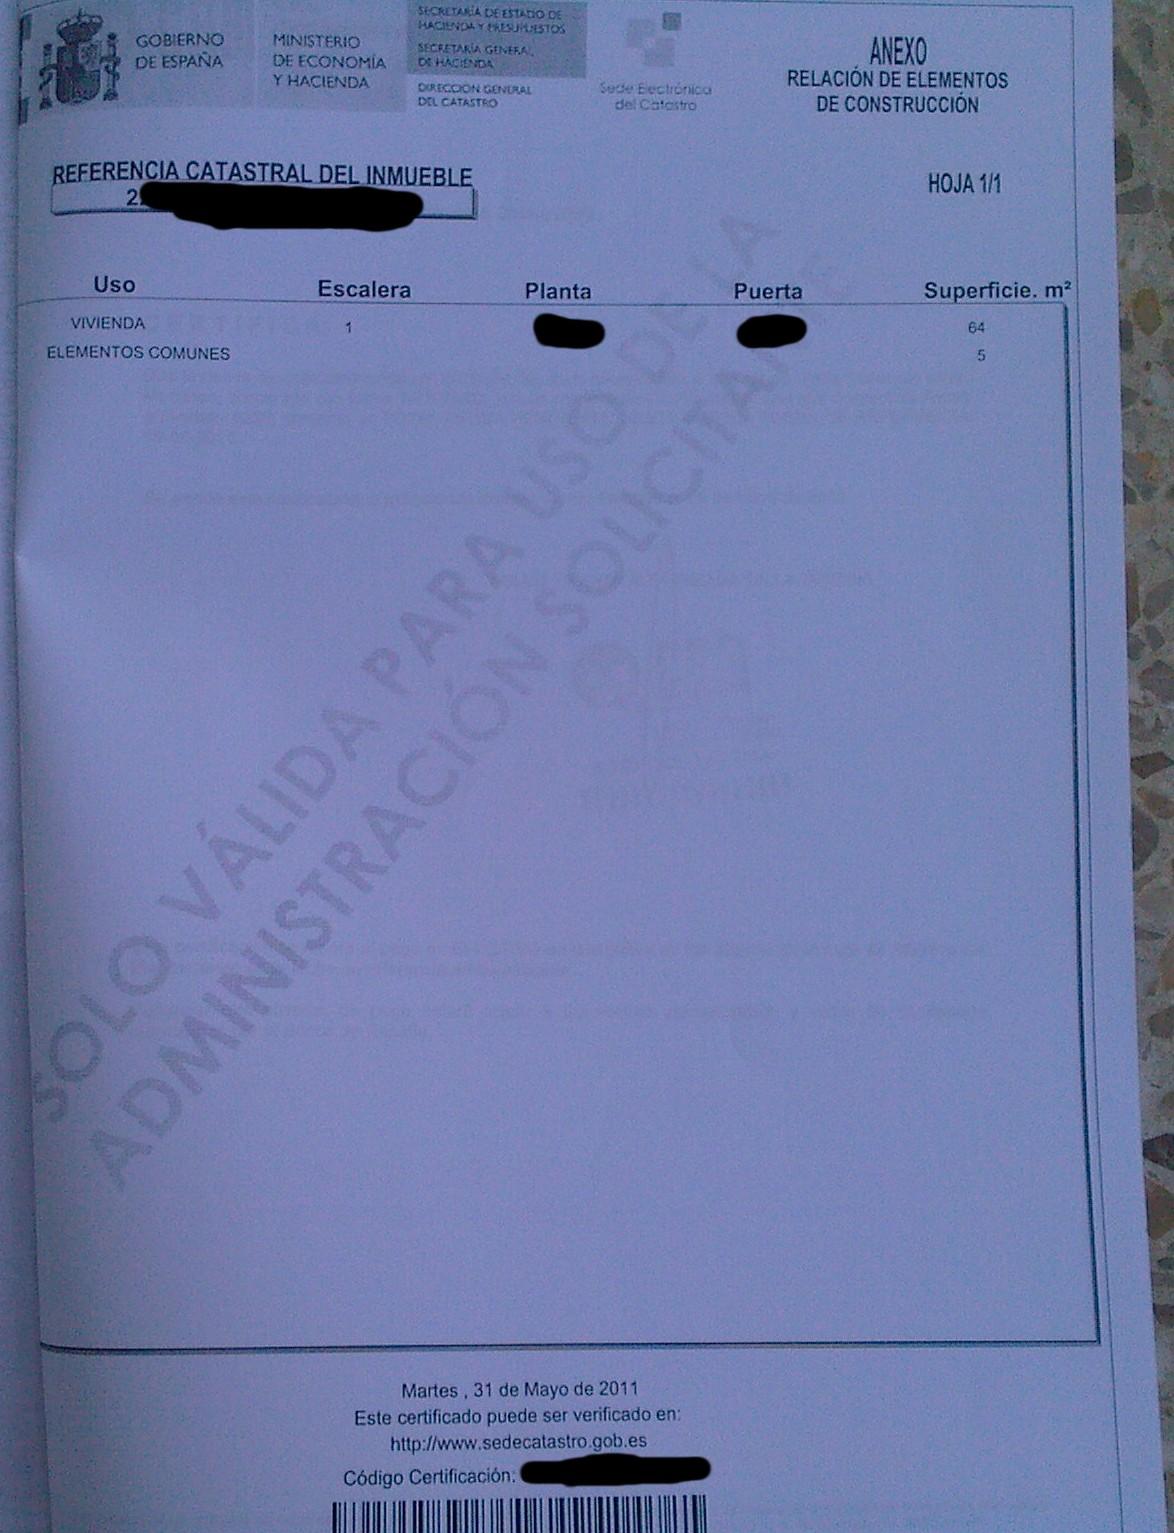 zetrader-reference-cadastrale-achat-appartement-espagne-31-mai-2011.jpg